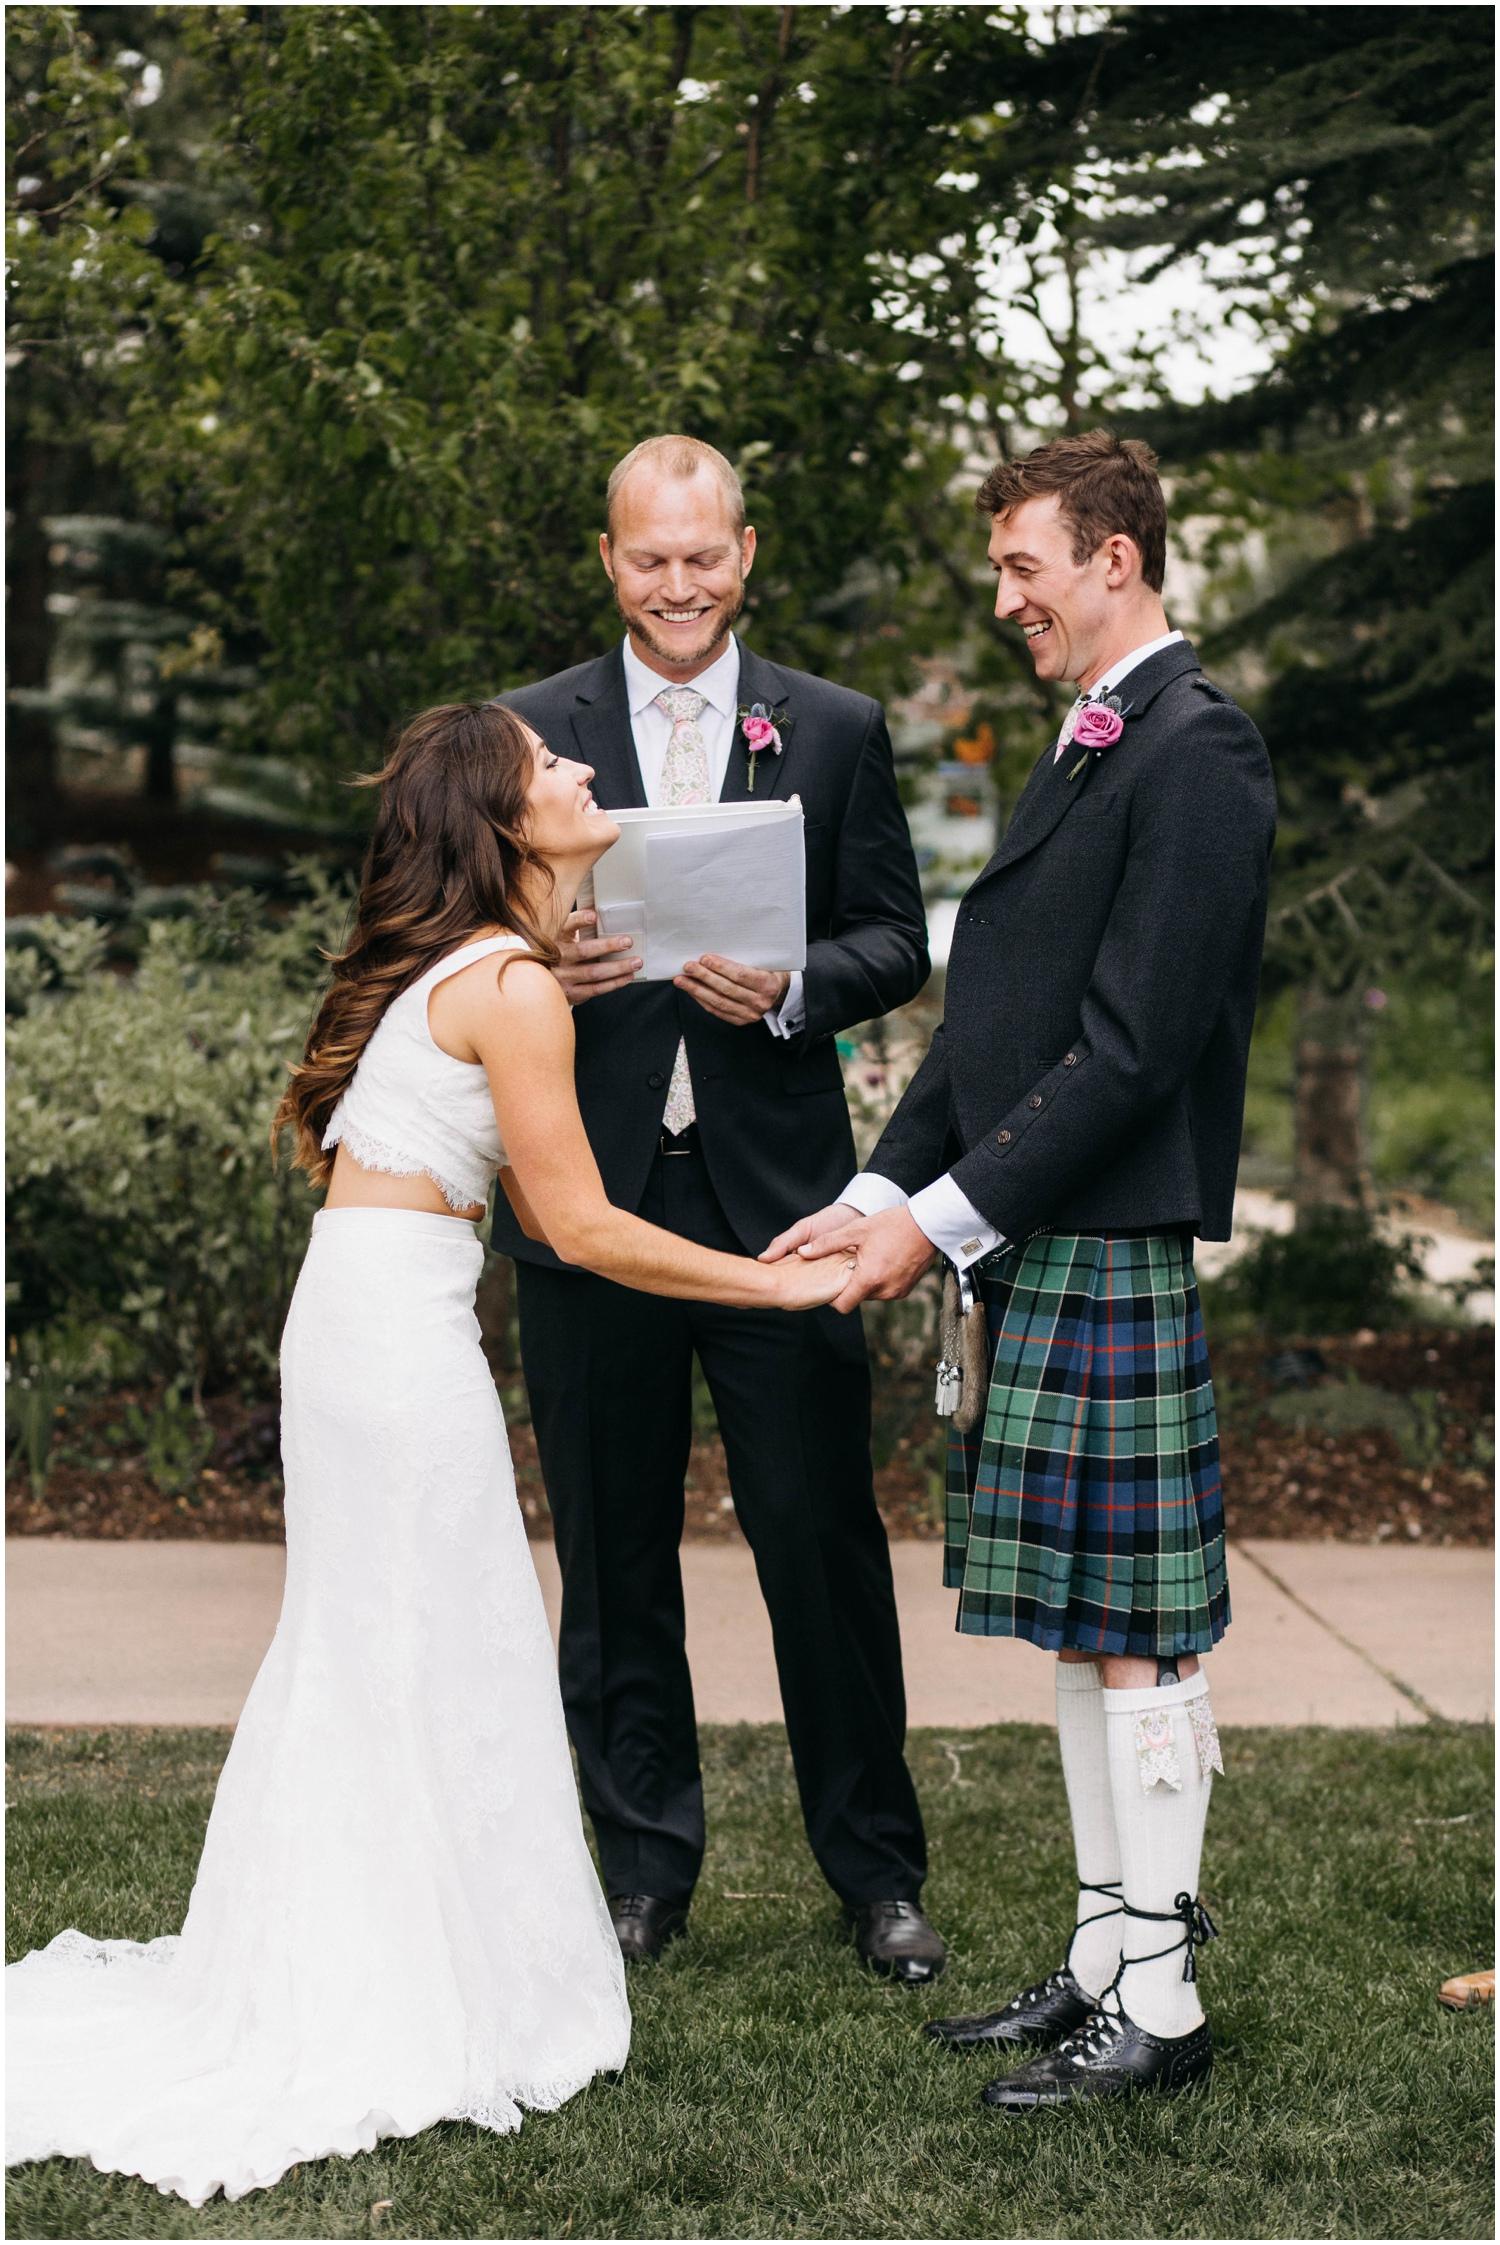 Courtney+Jamie_modern_vail_village_wedding_colorado_taylor_powers_0080.jpg